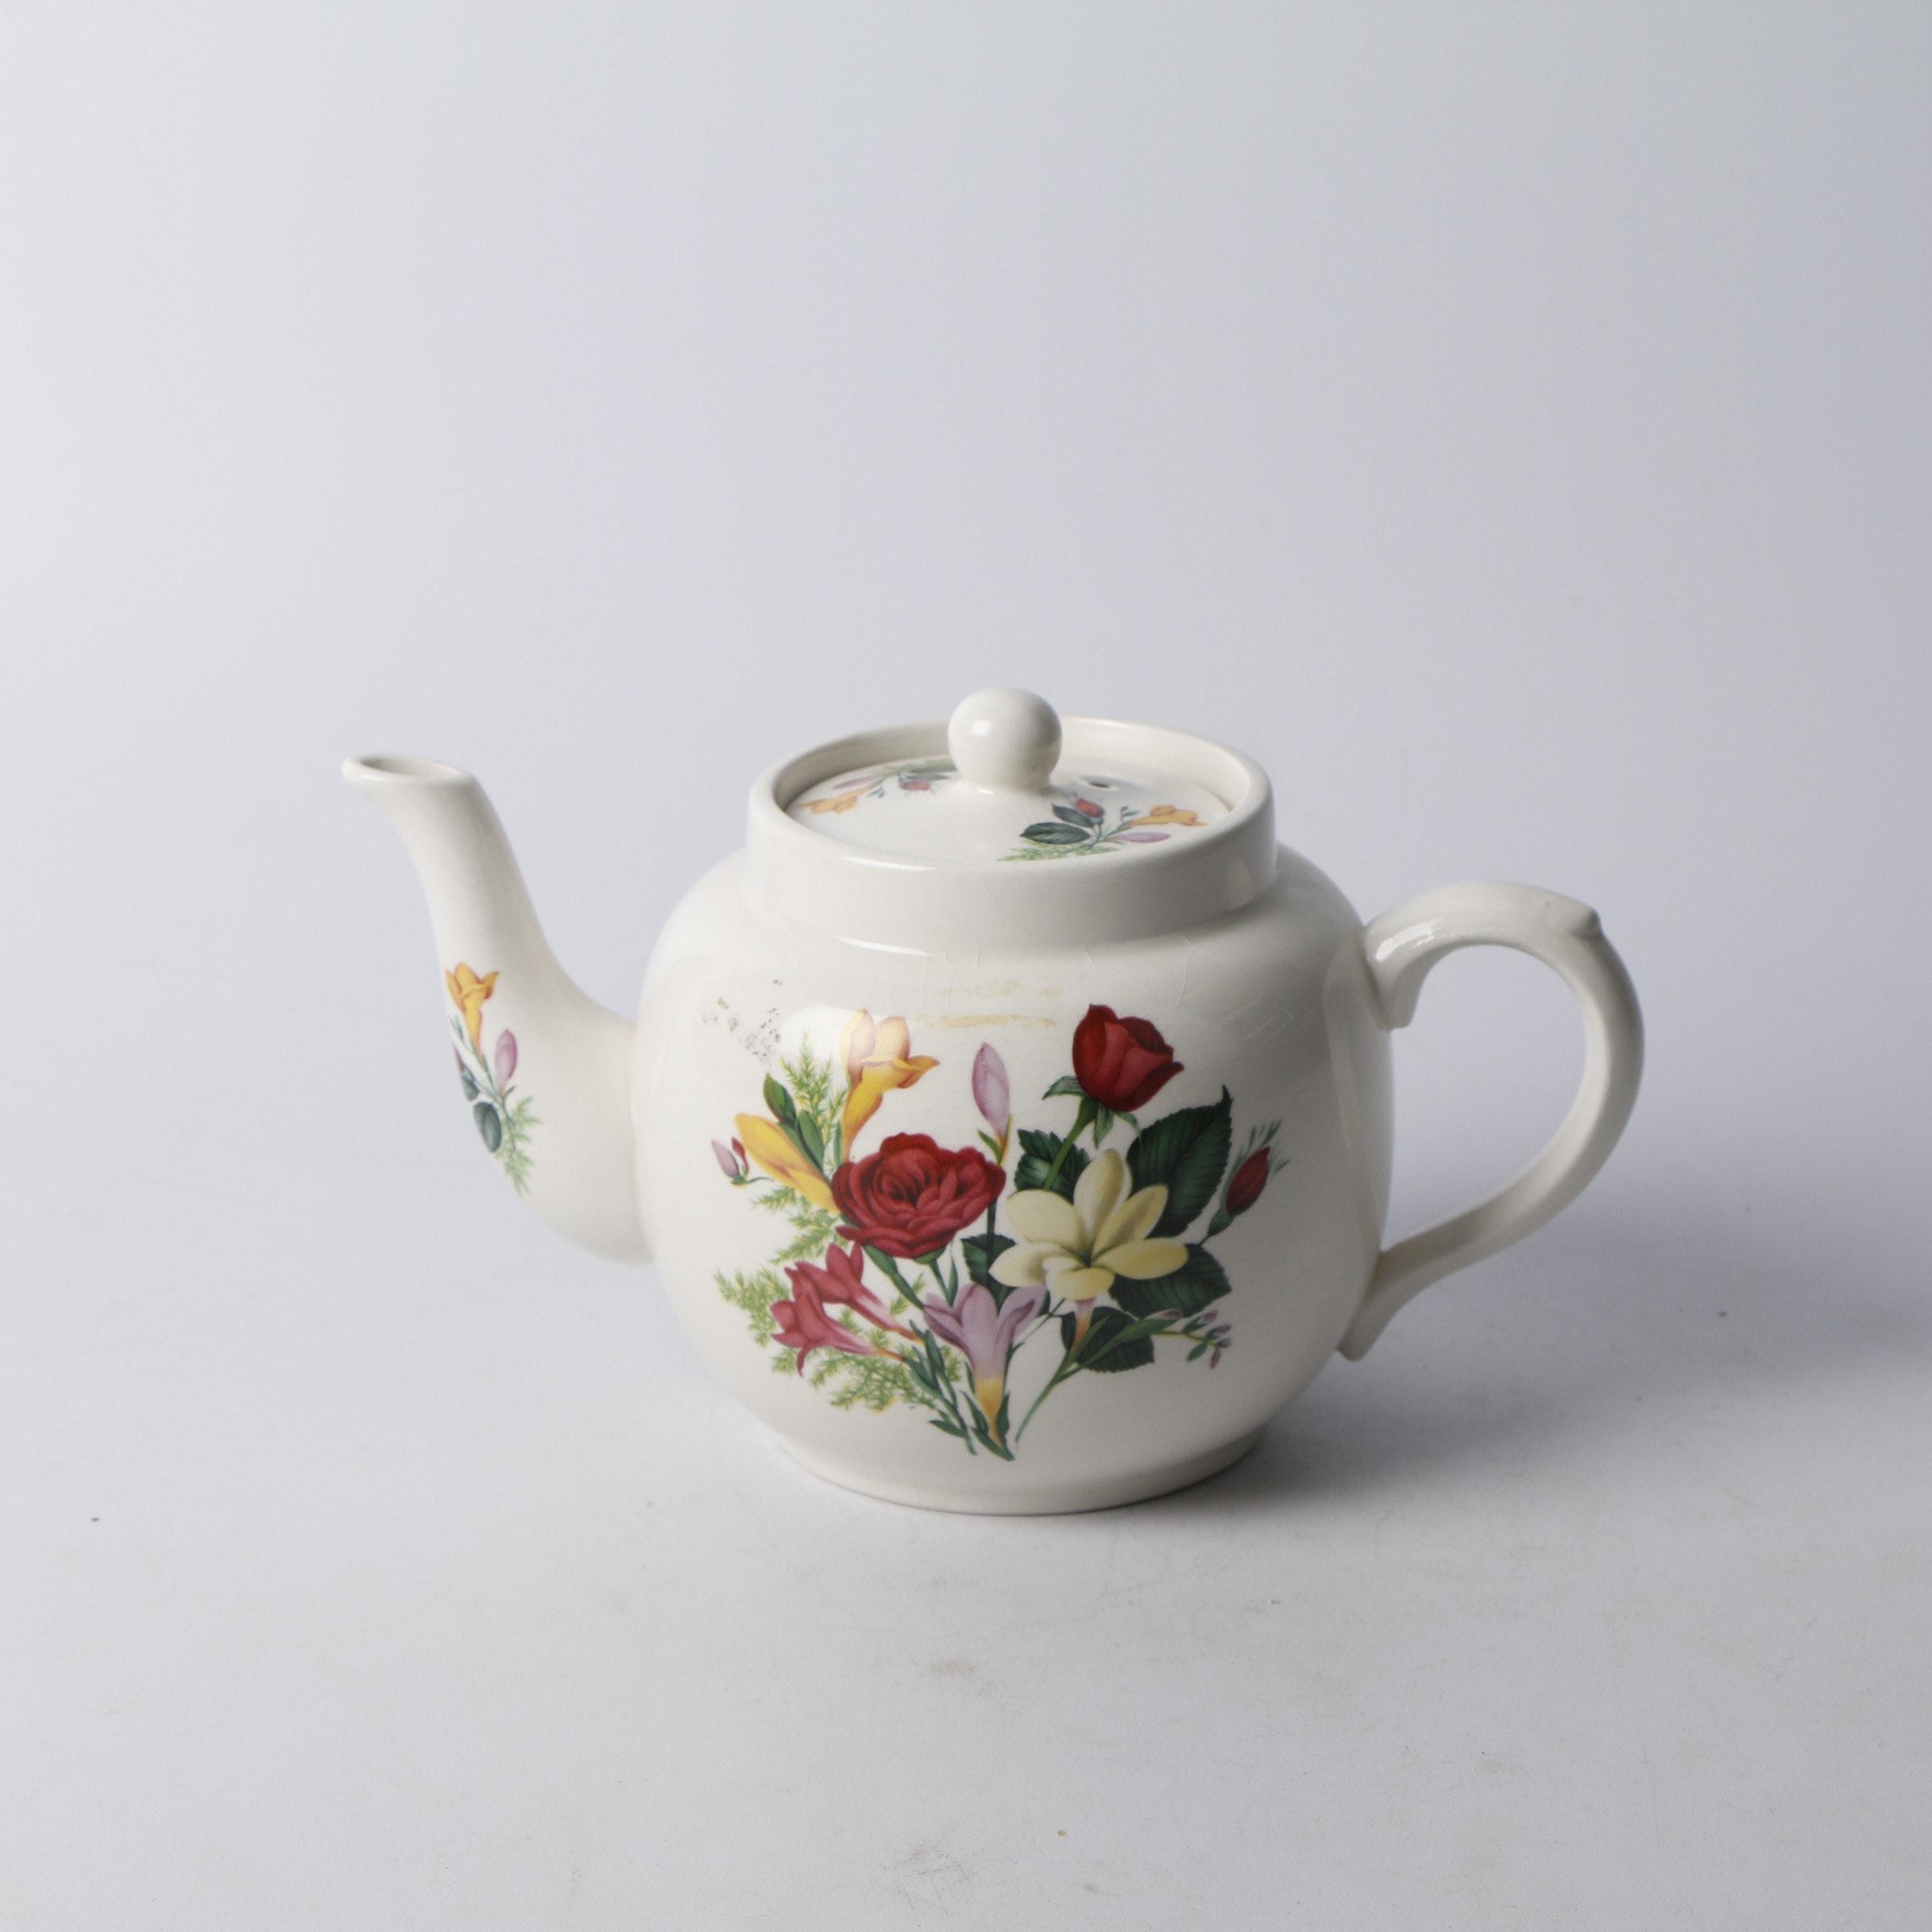 Vintage Price Kensington Floral-Themed Teapot